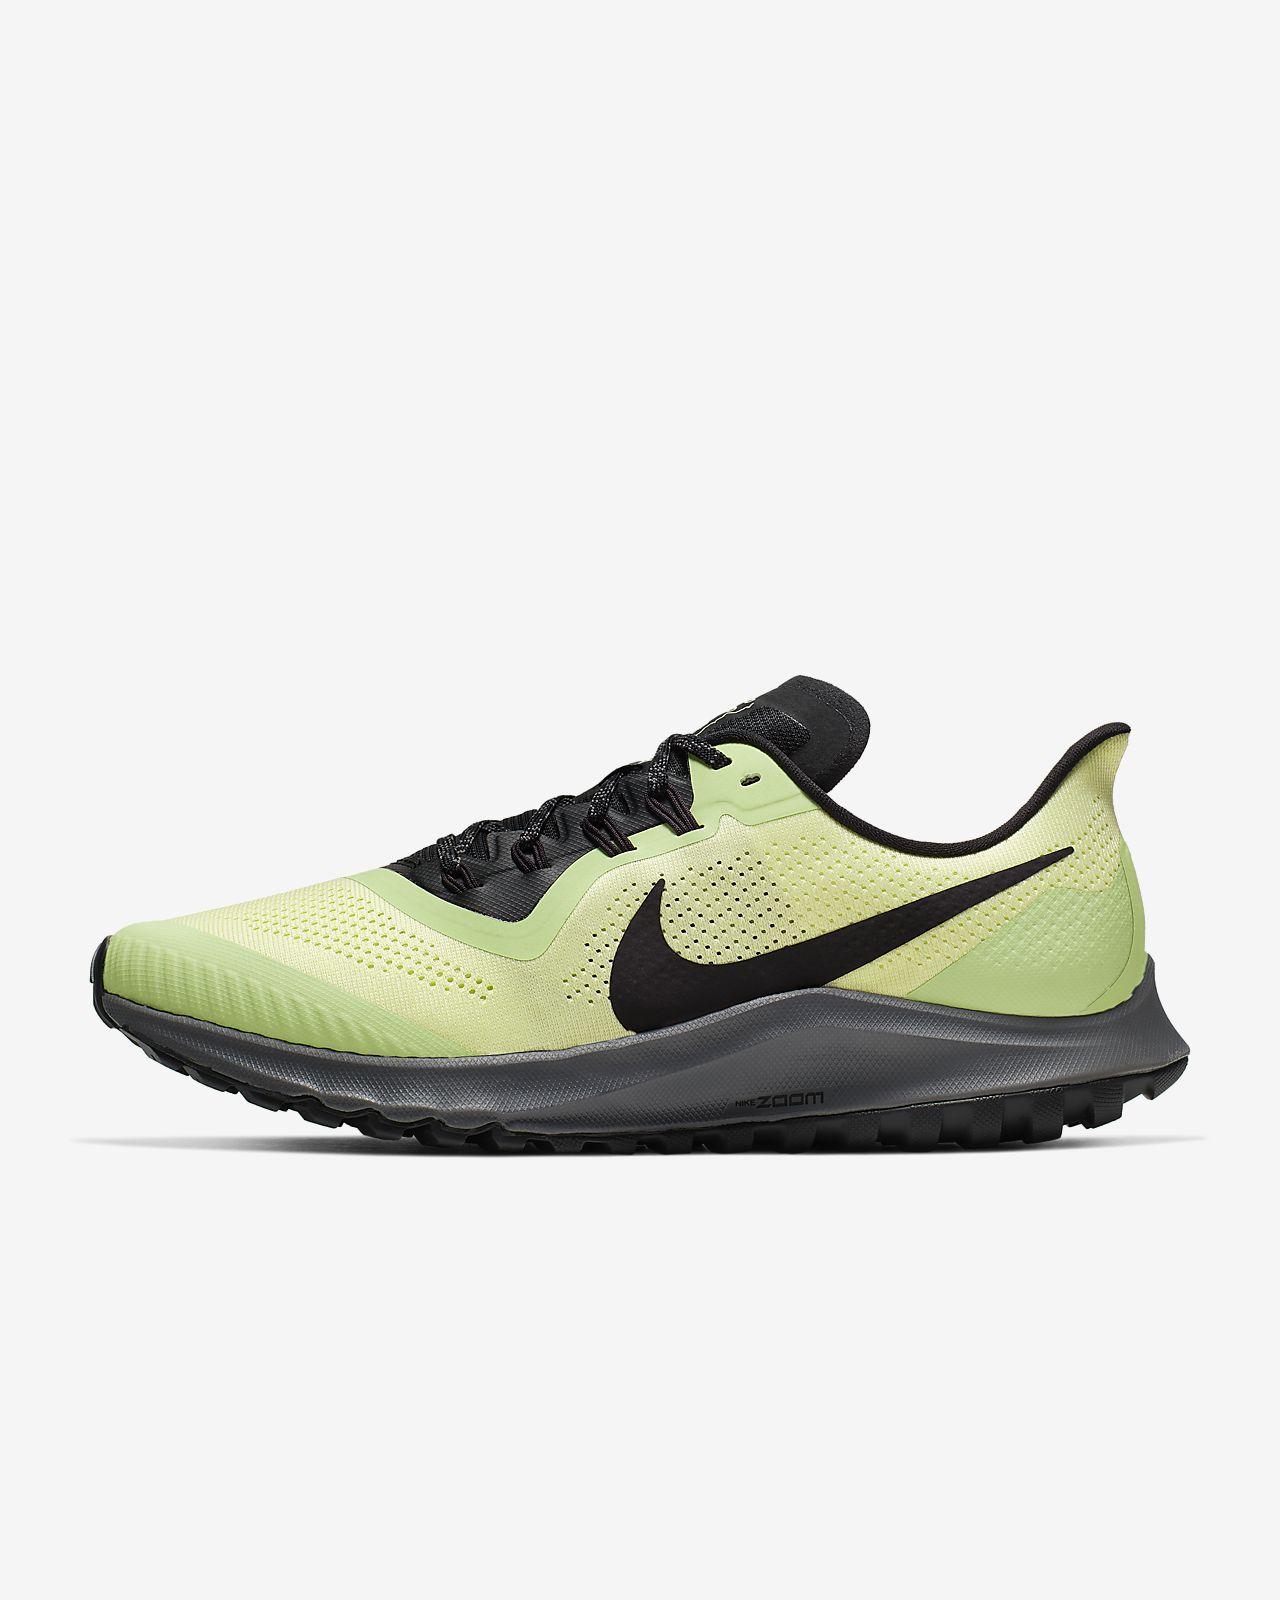 new arrival 4e156 1e28a ... Calzado de running para hombre Nike Air Zoom Pegasus 36 Trail